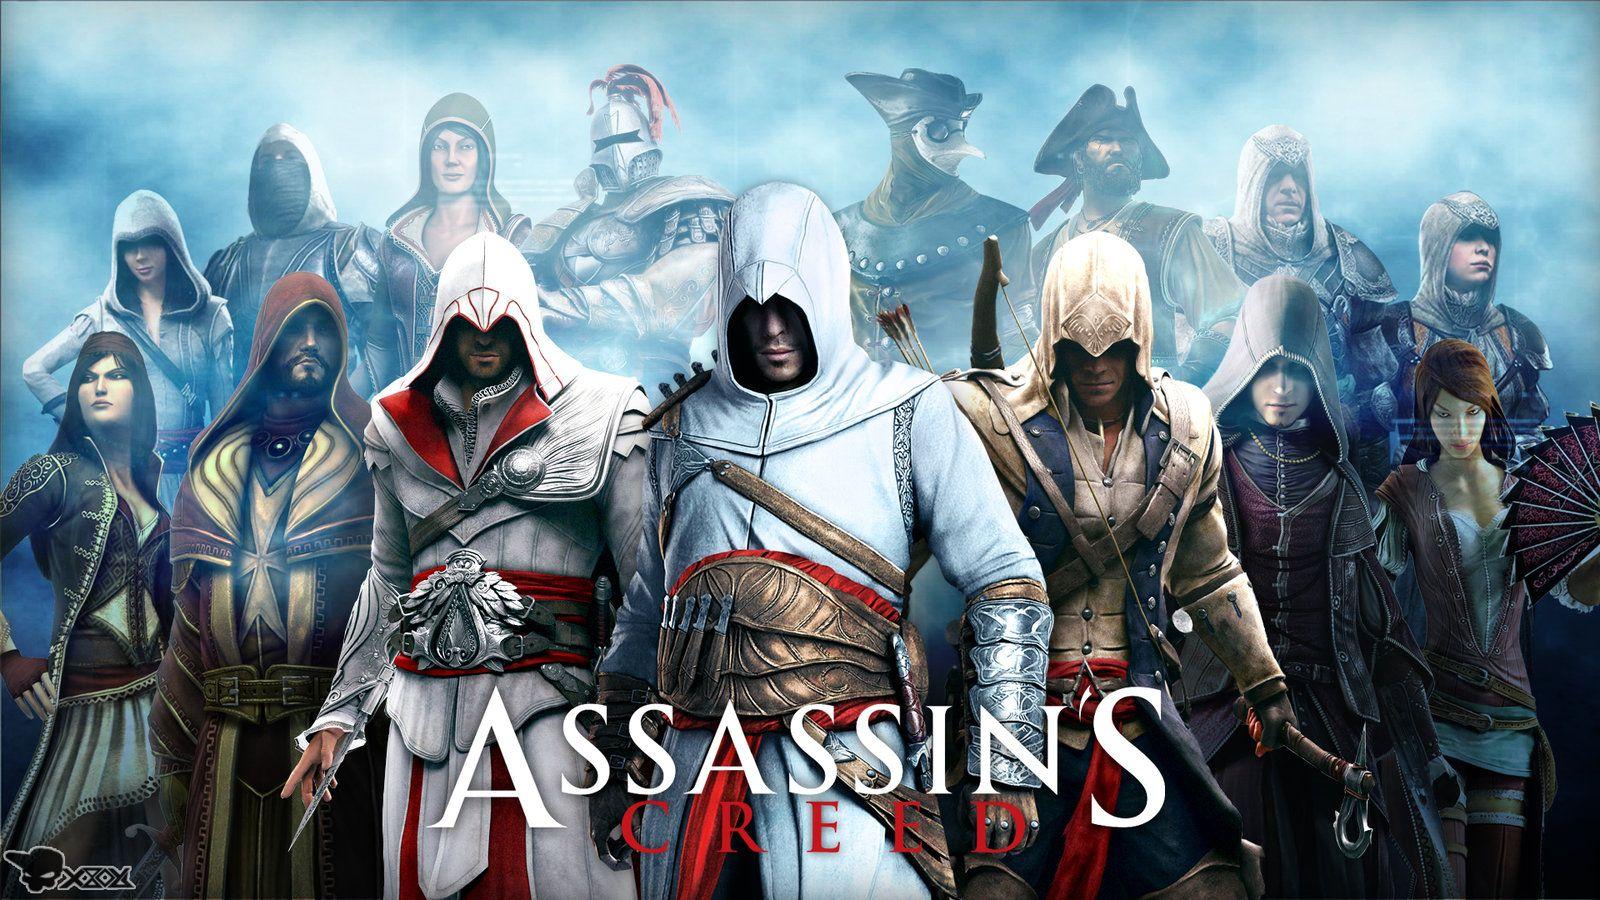 Pin By Darth Jose Dark Lord Of The S On Assassins Creed Assassin S Creed Assassins Creed Assassins Creed Logo